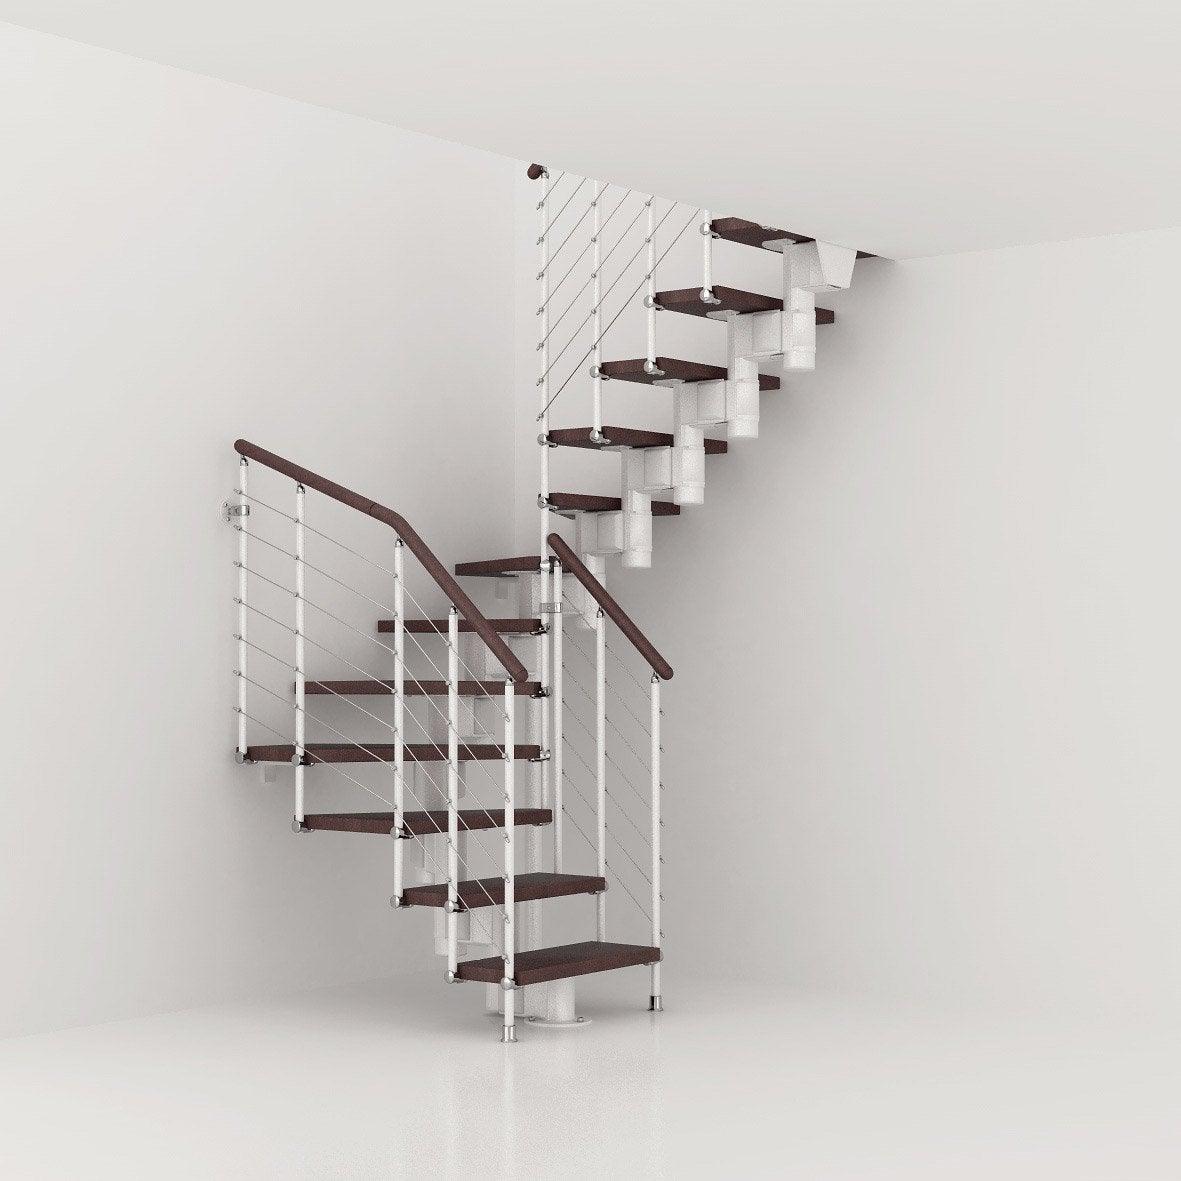 Escalier Bois Leroy Merlin : Longline, marches bois/ structure m?tal blanc Leroy Merlin